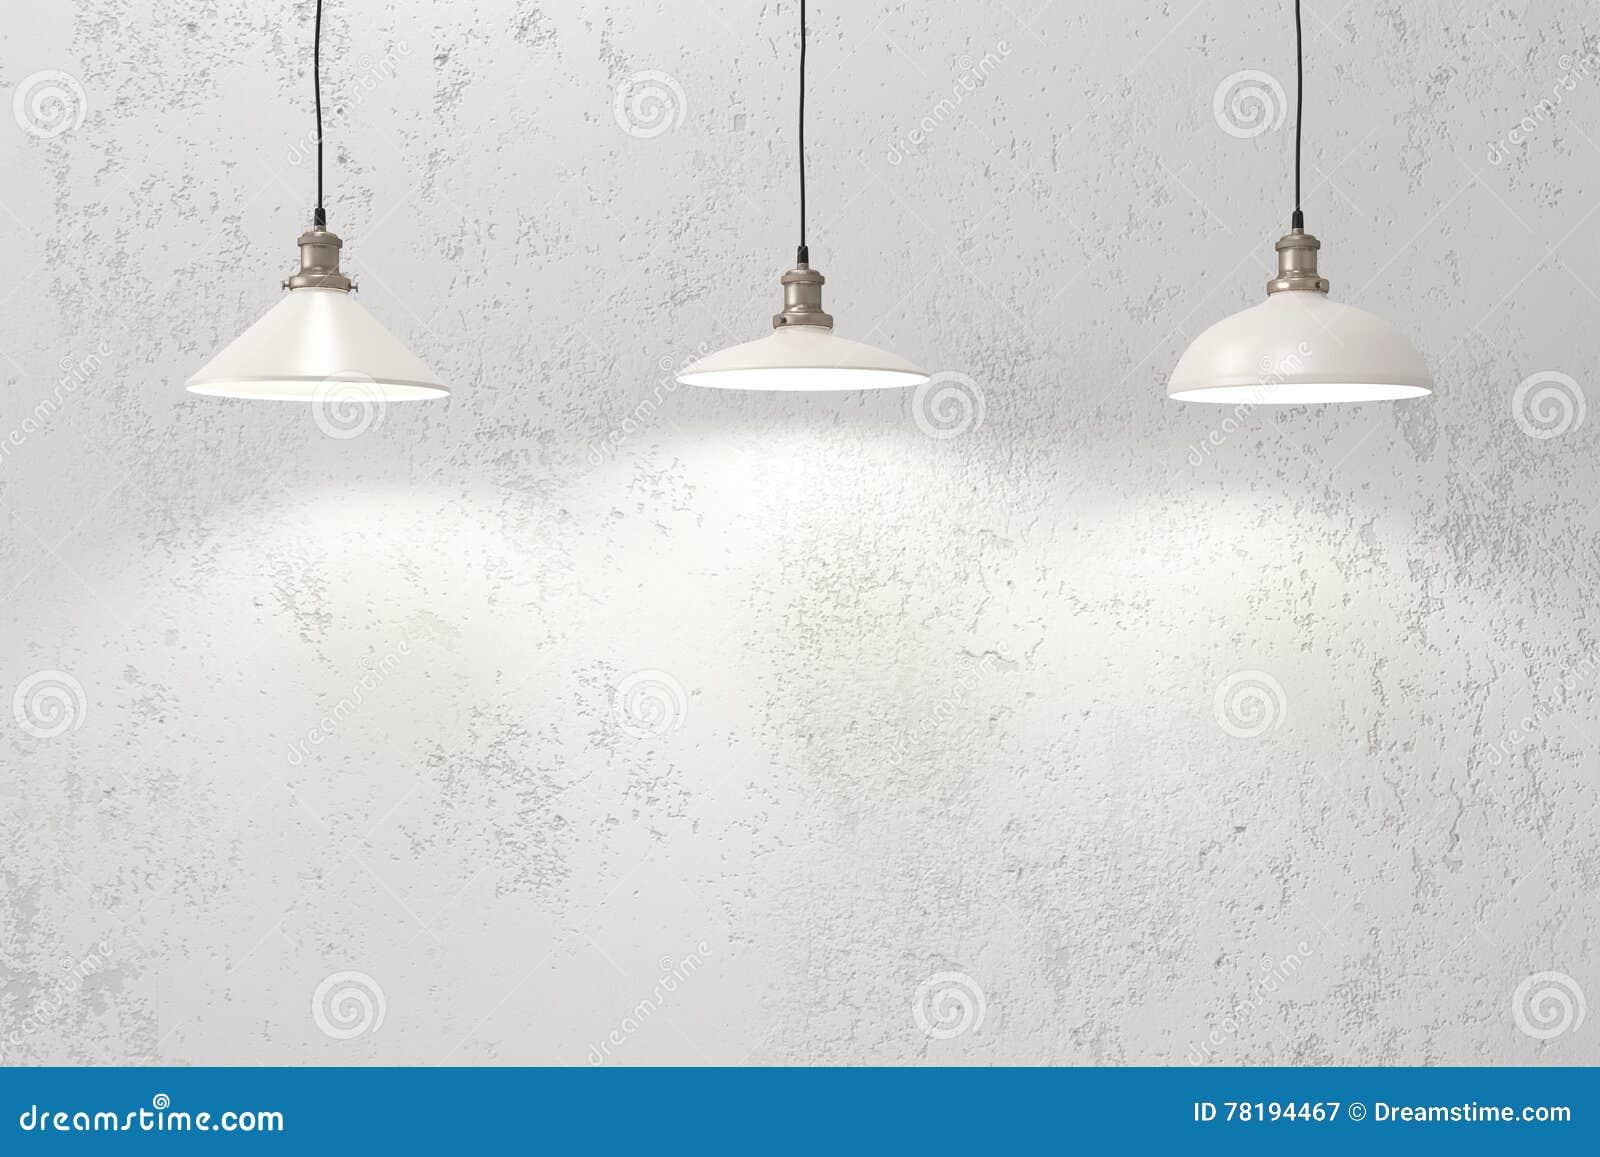 Industrielle Hängende Lampen Stockbild - Bild von szene, raum: 78194467